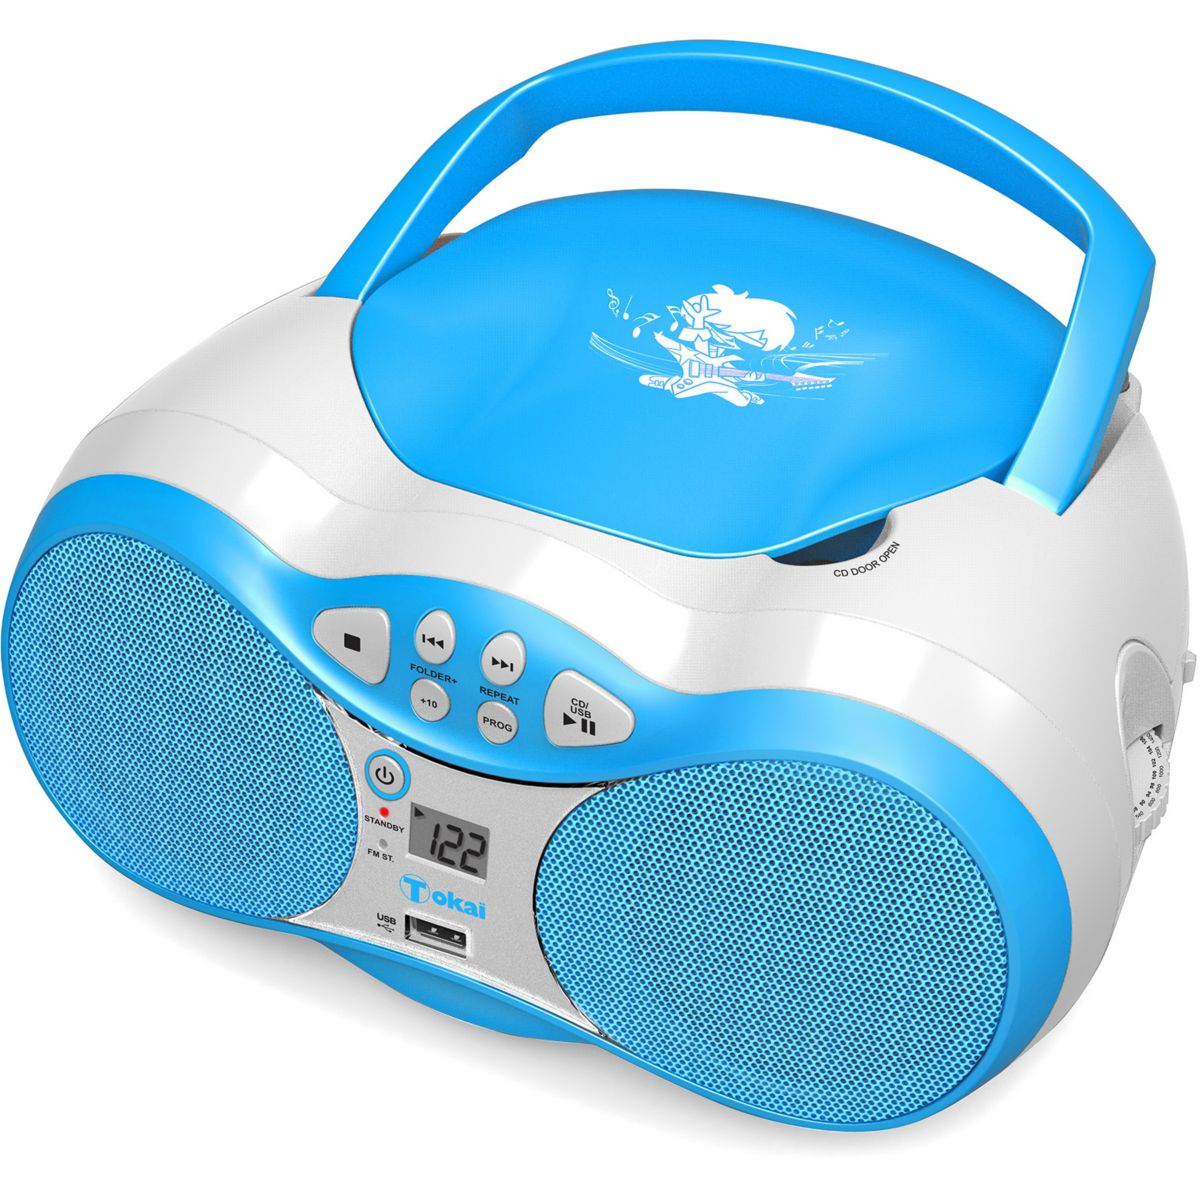 Radio cd boombox tokai tb-207 bleu - 2% de remise imm�diate avec le code : wd2 (photo)